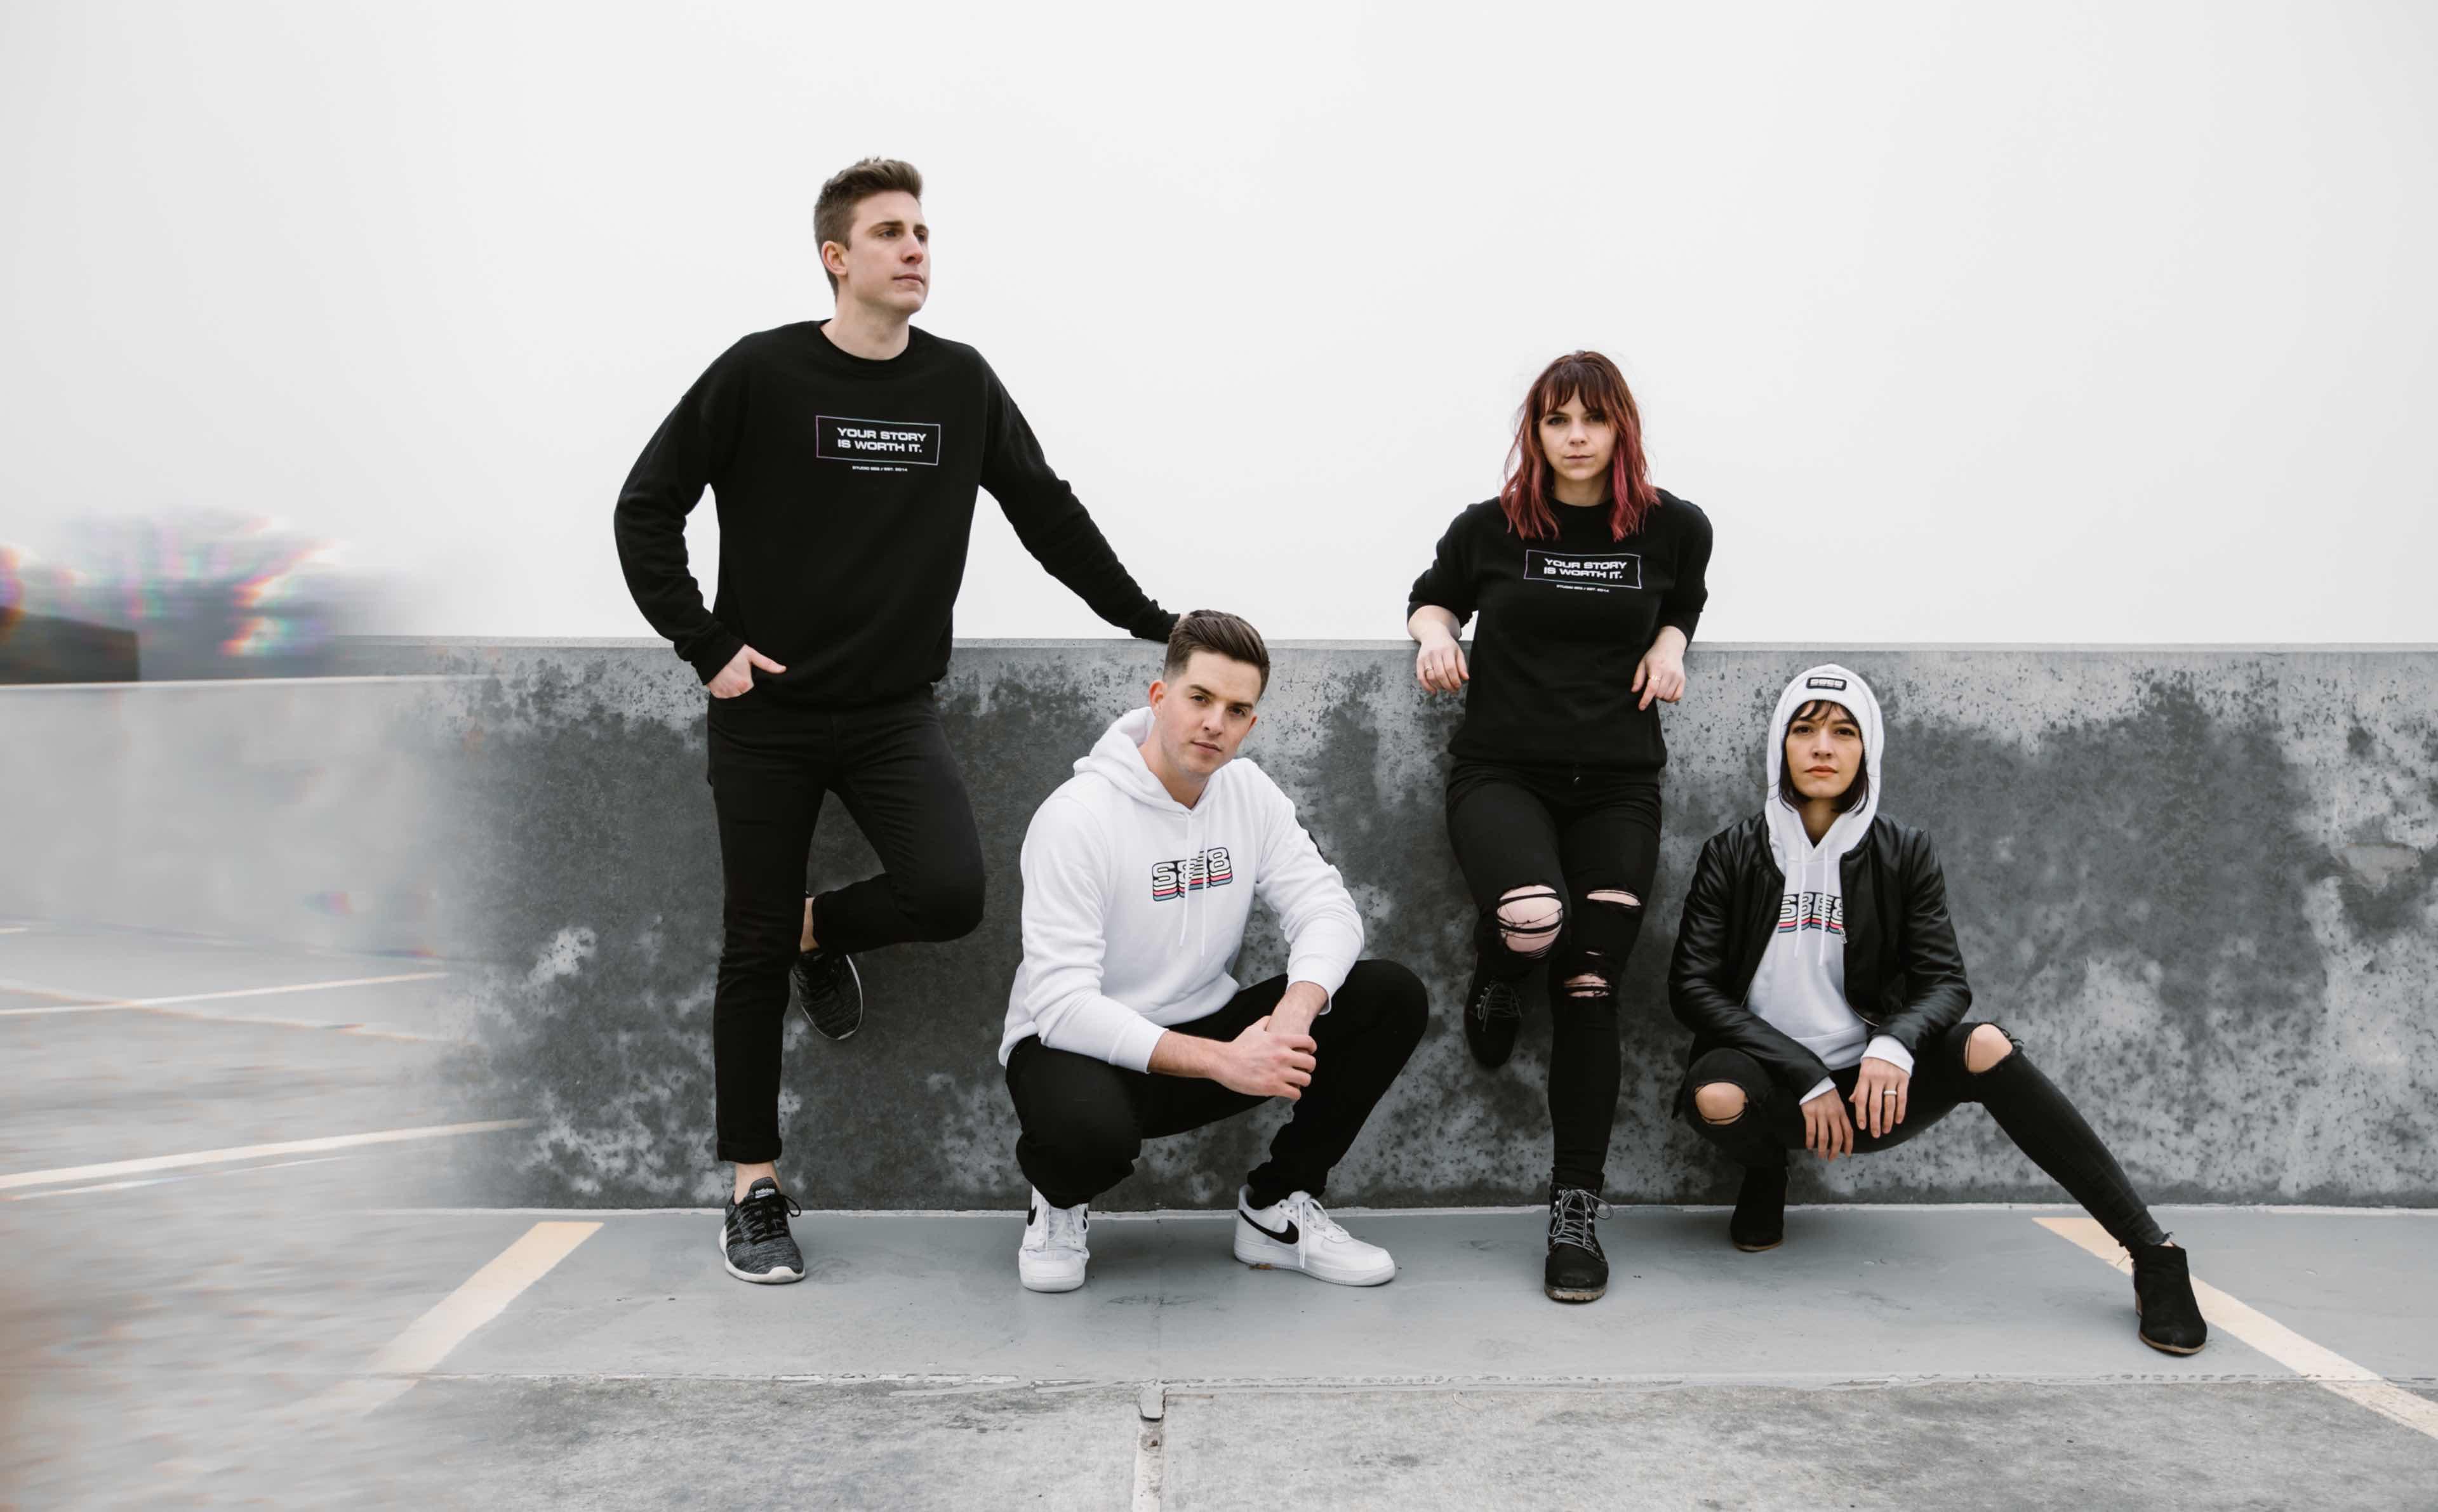 Photo of the Studio 8E8 team wearing their hoodies and sweatshirts